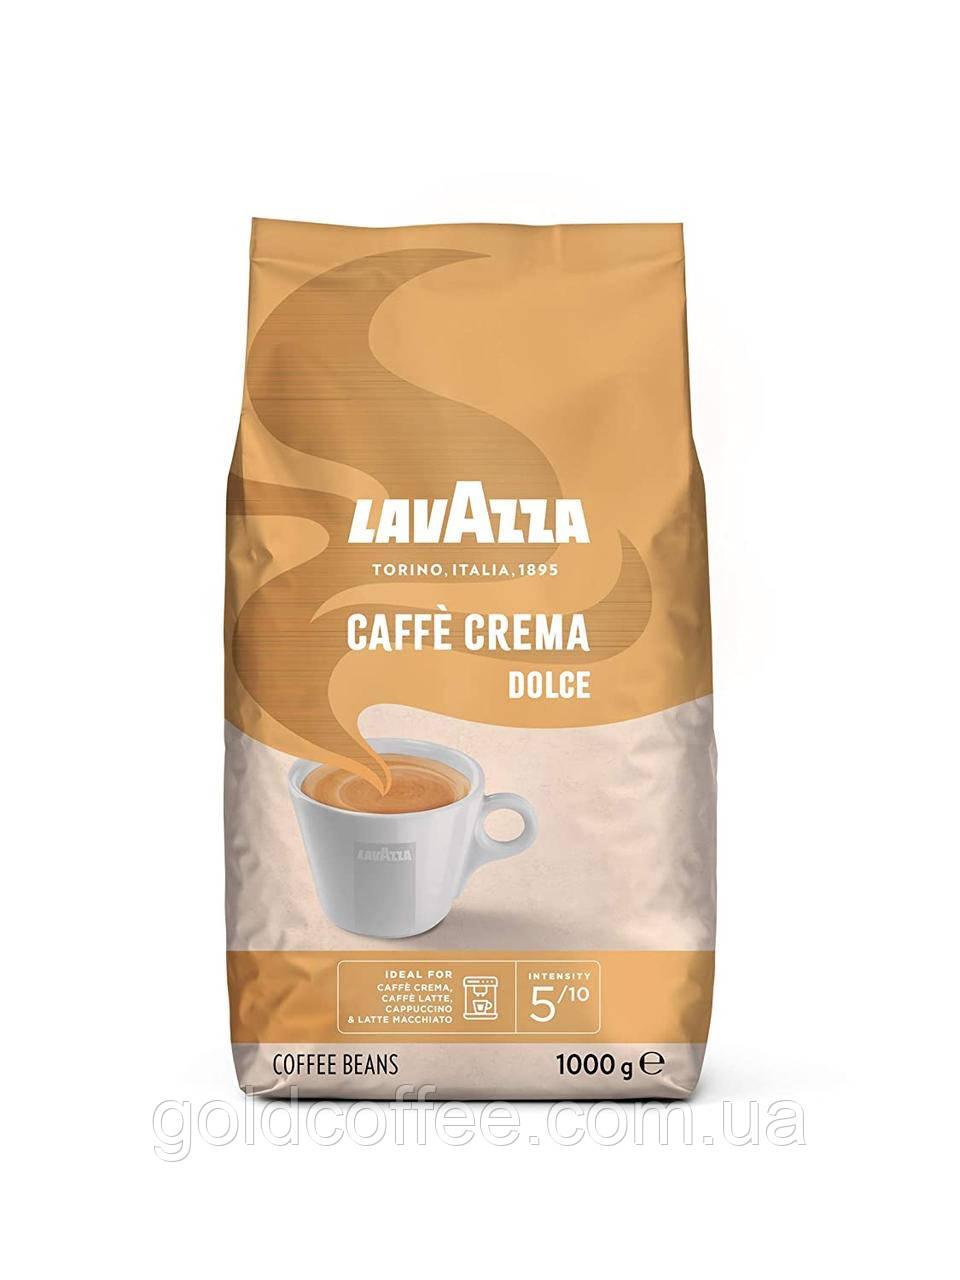 Зернова кава Lavazza Dolce Caffe Crema, 1кг